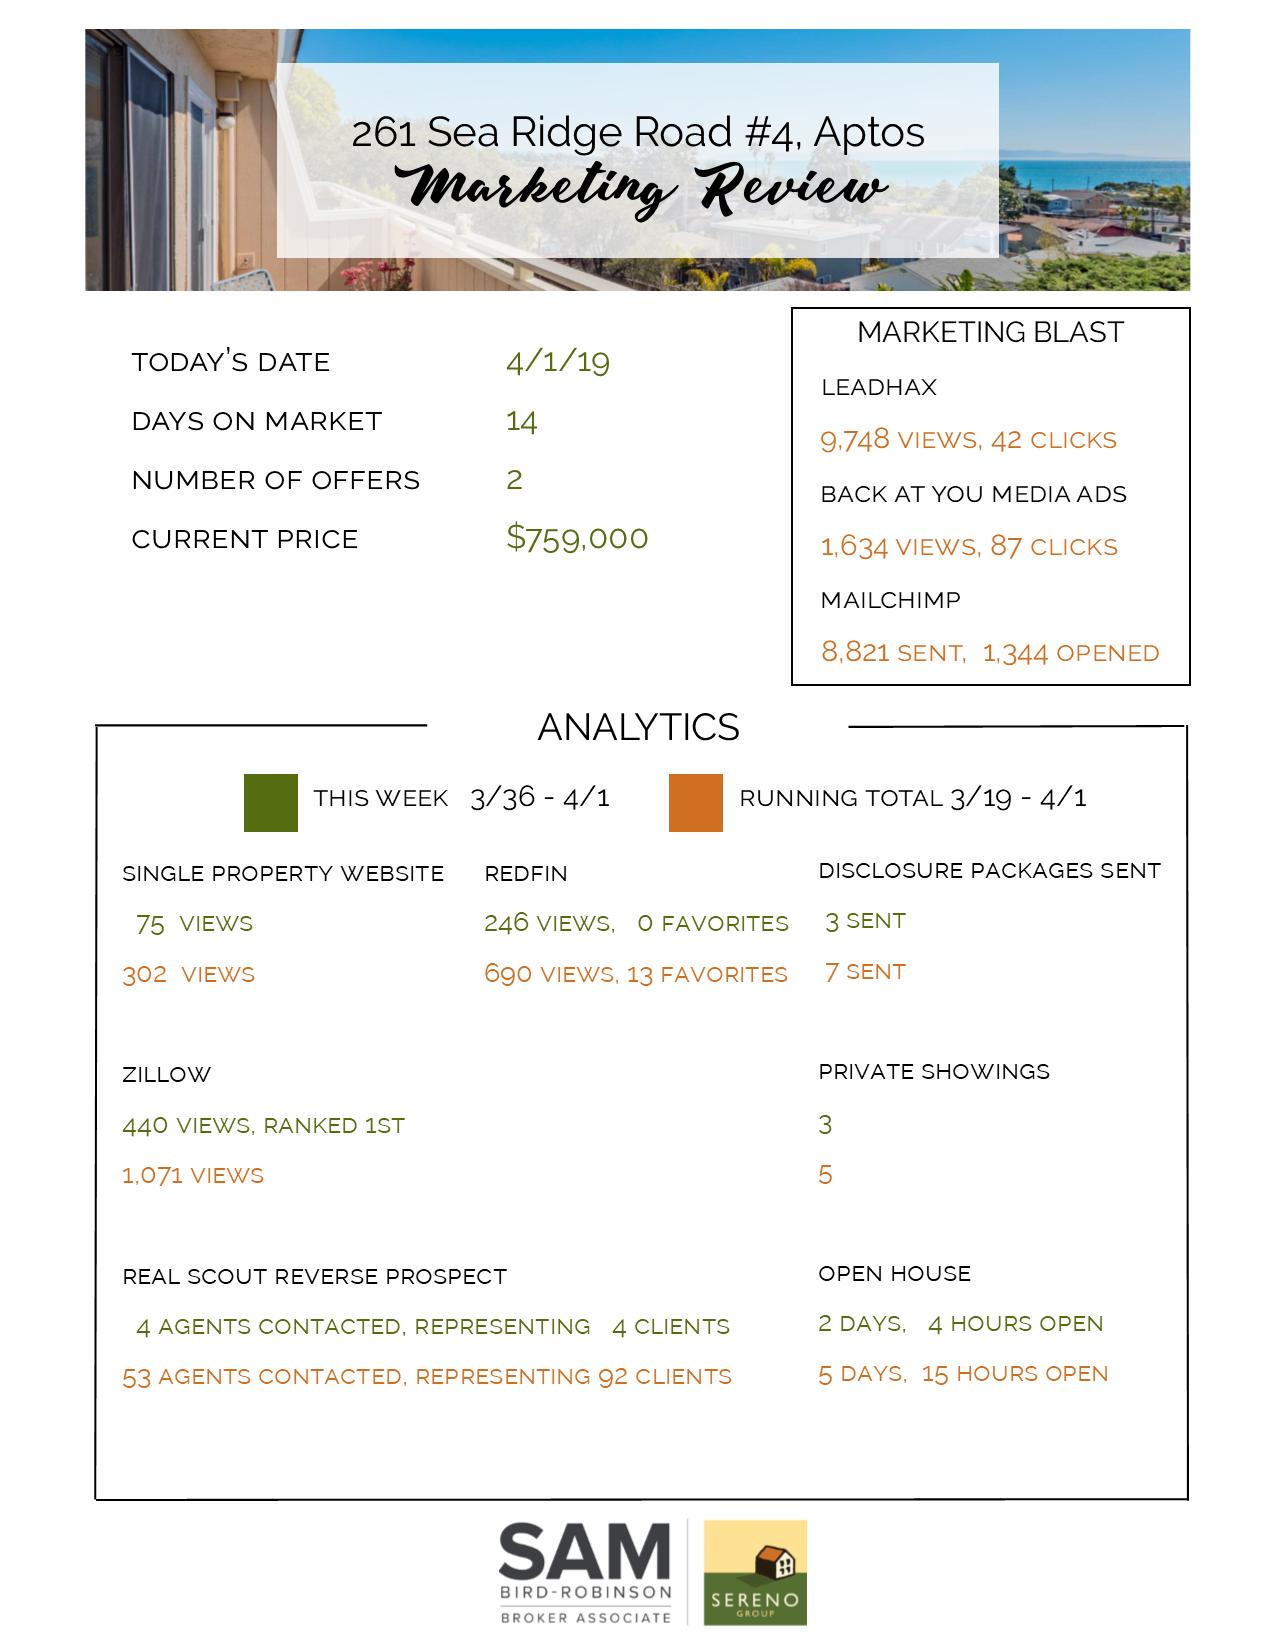 Marketing Review 261 Sea Ridge #4 4.1.19.png